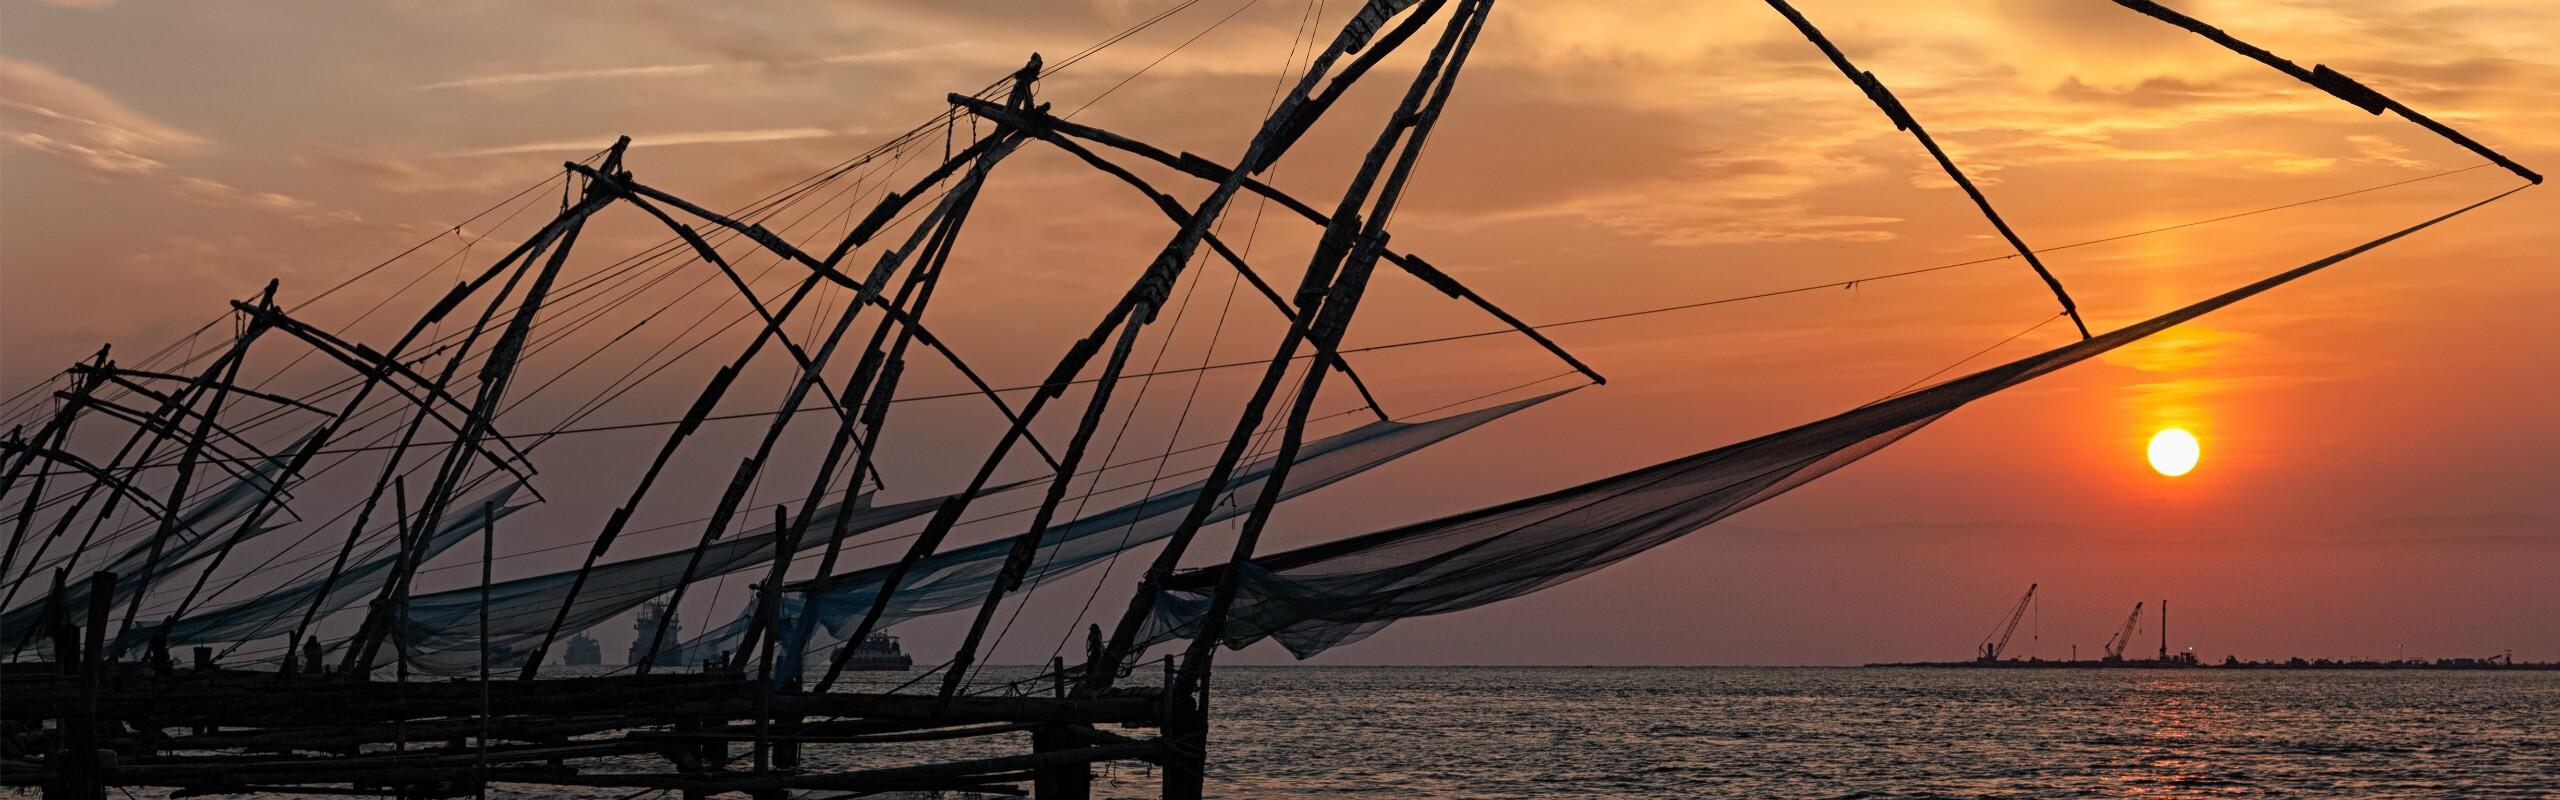 How to Plan a Trip to Kerala